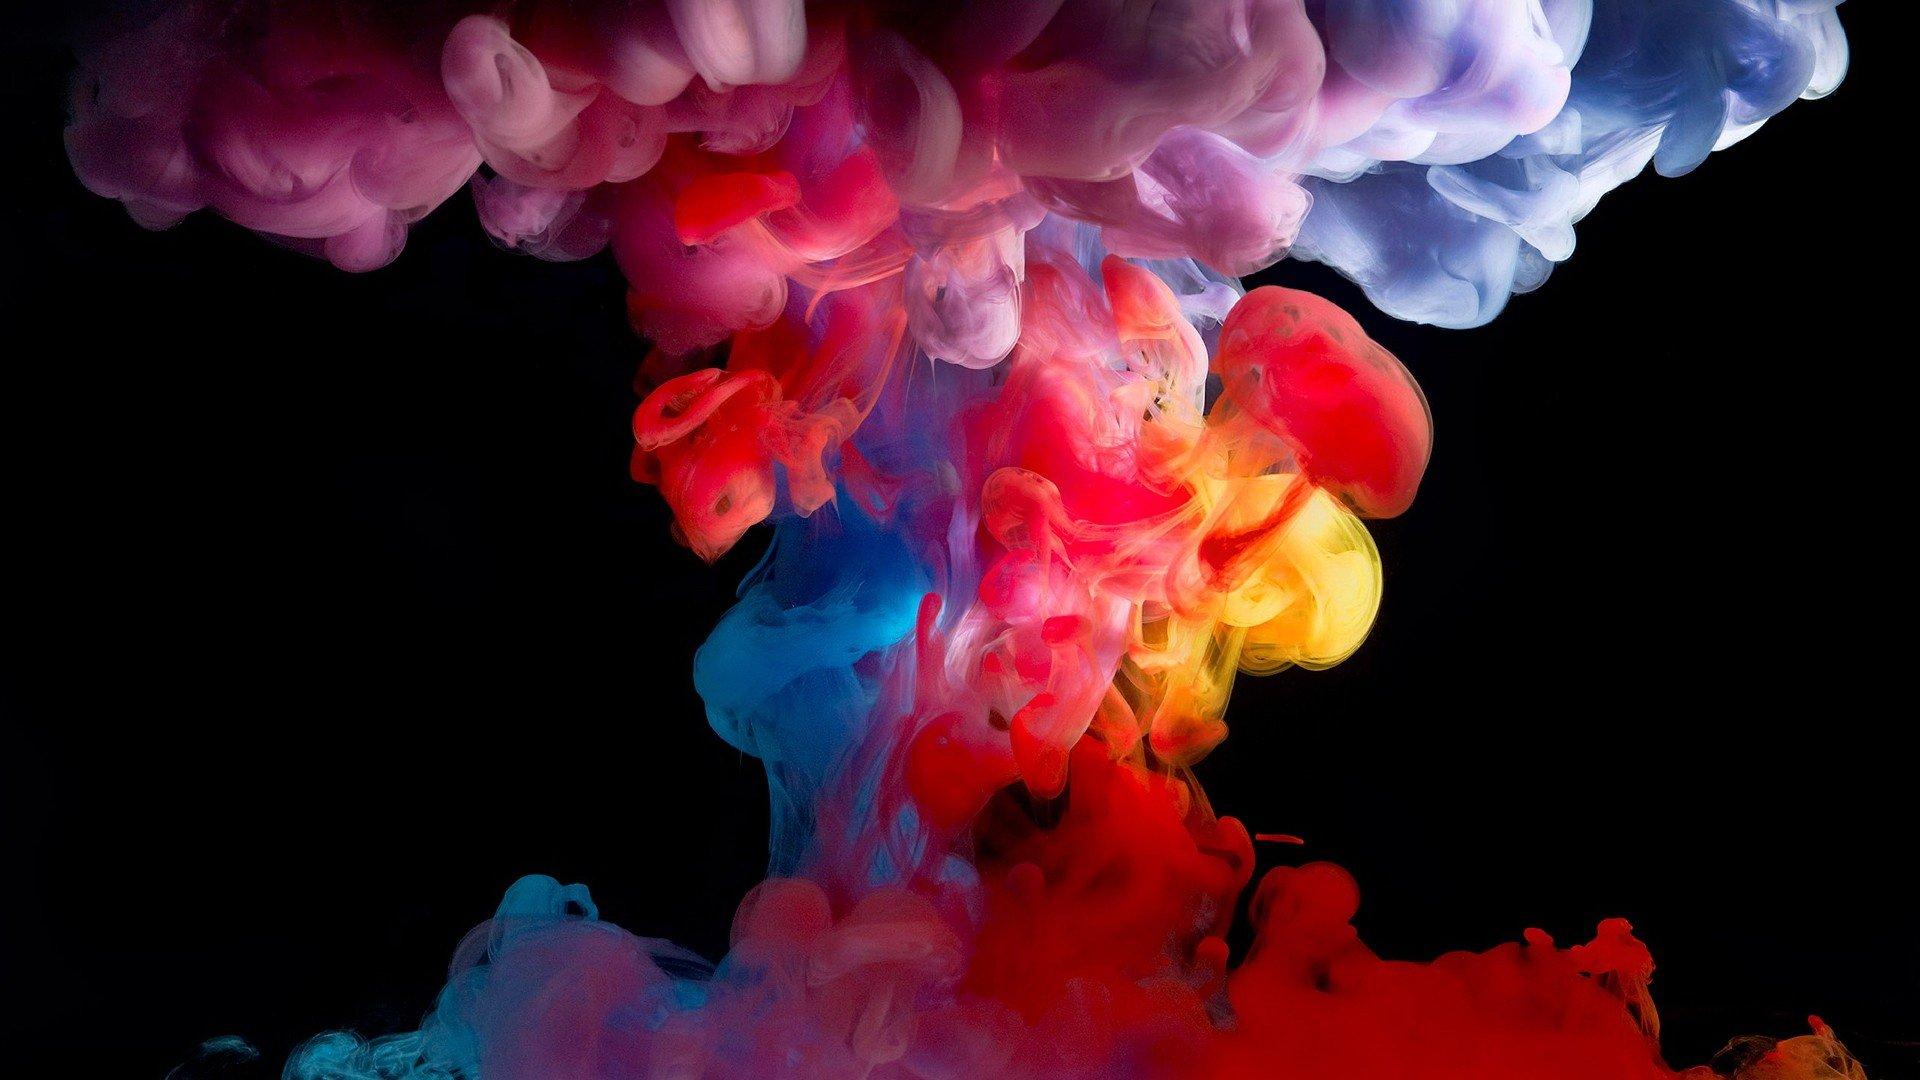 Download Colorful Smoke Wallpaper Wallpapers 1920x1080